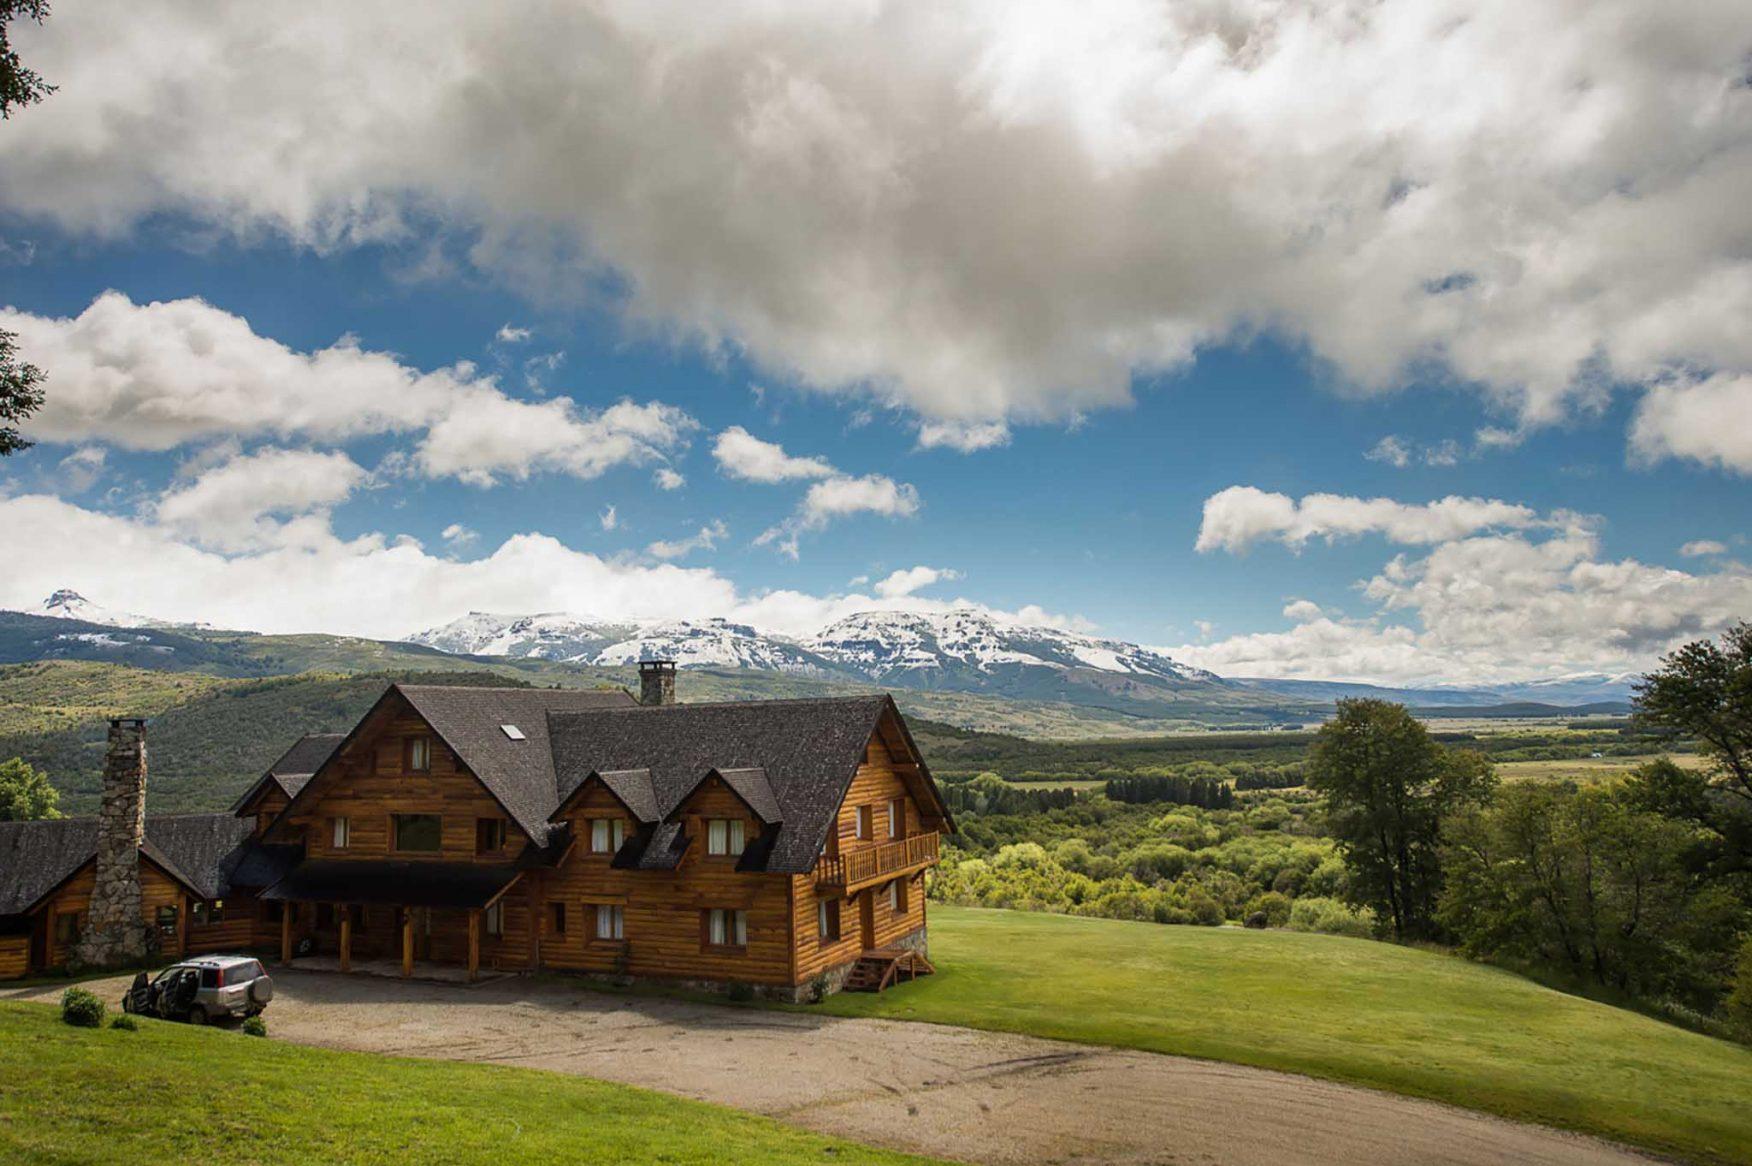 argentina-patagonia-wilderness-caballadas-mainhouse